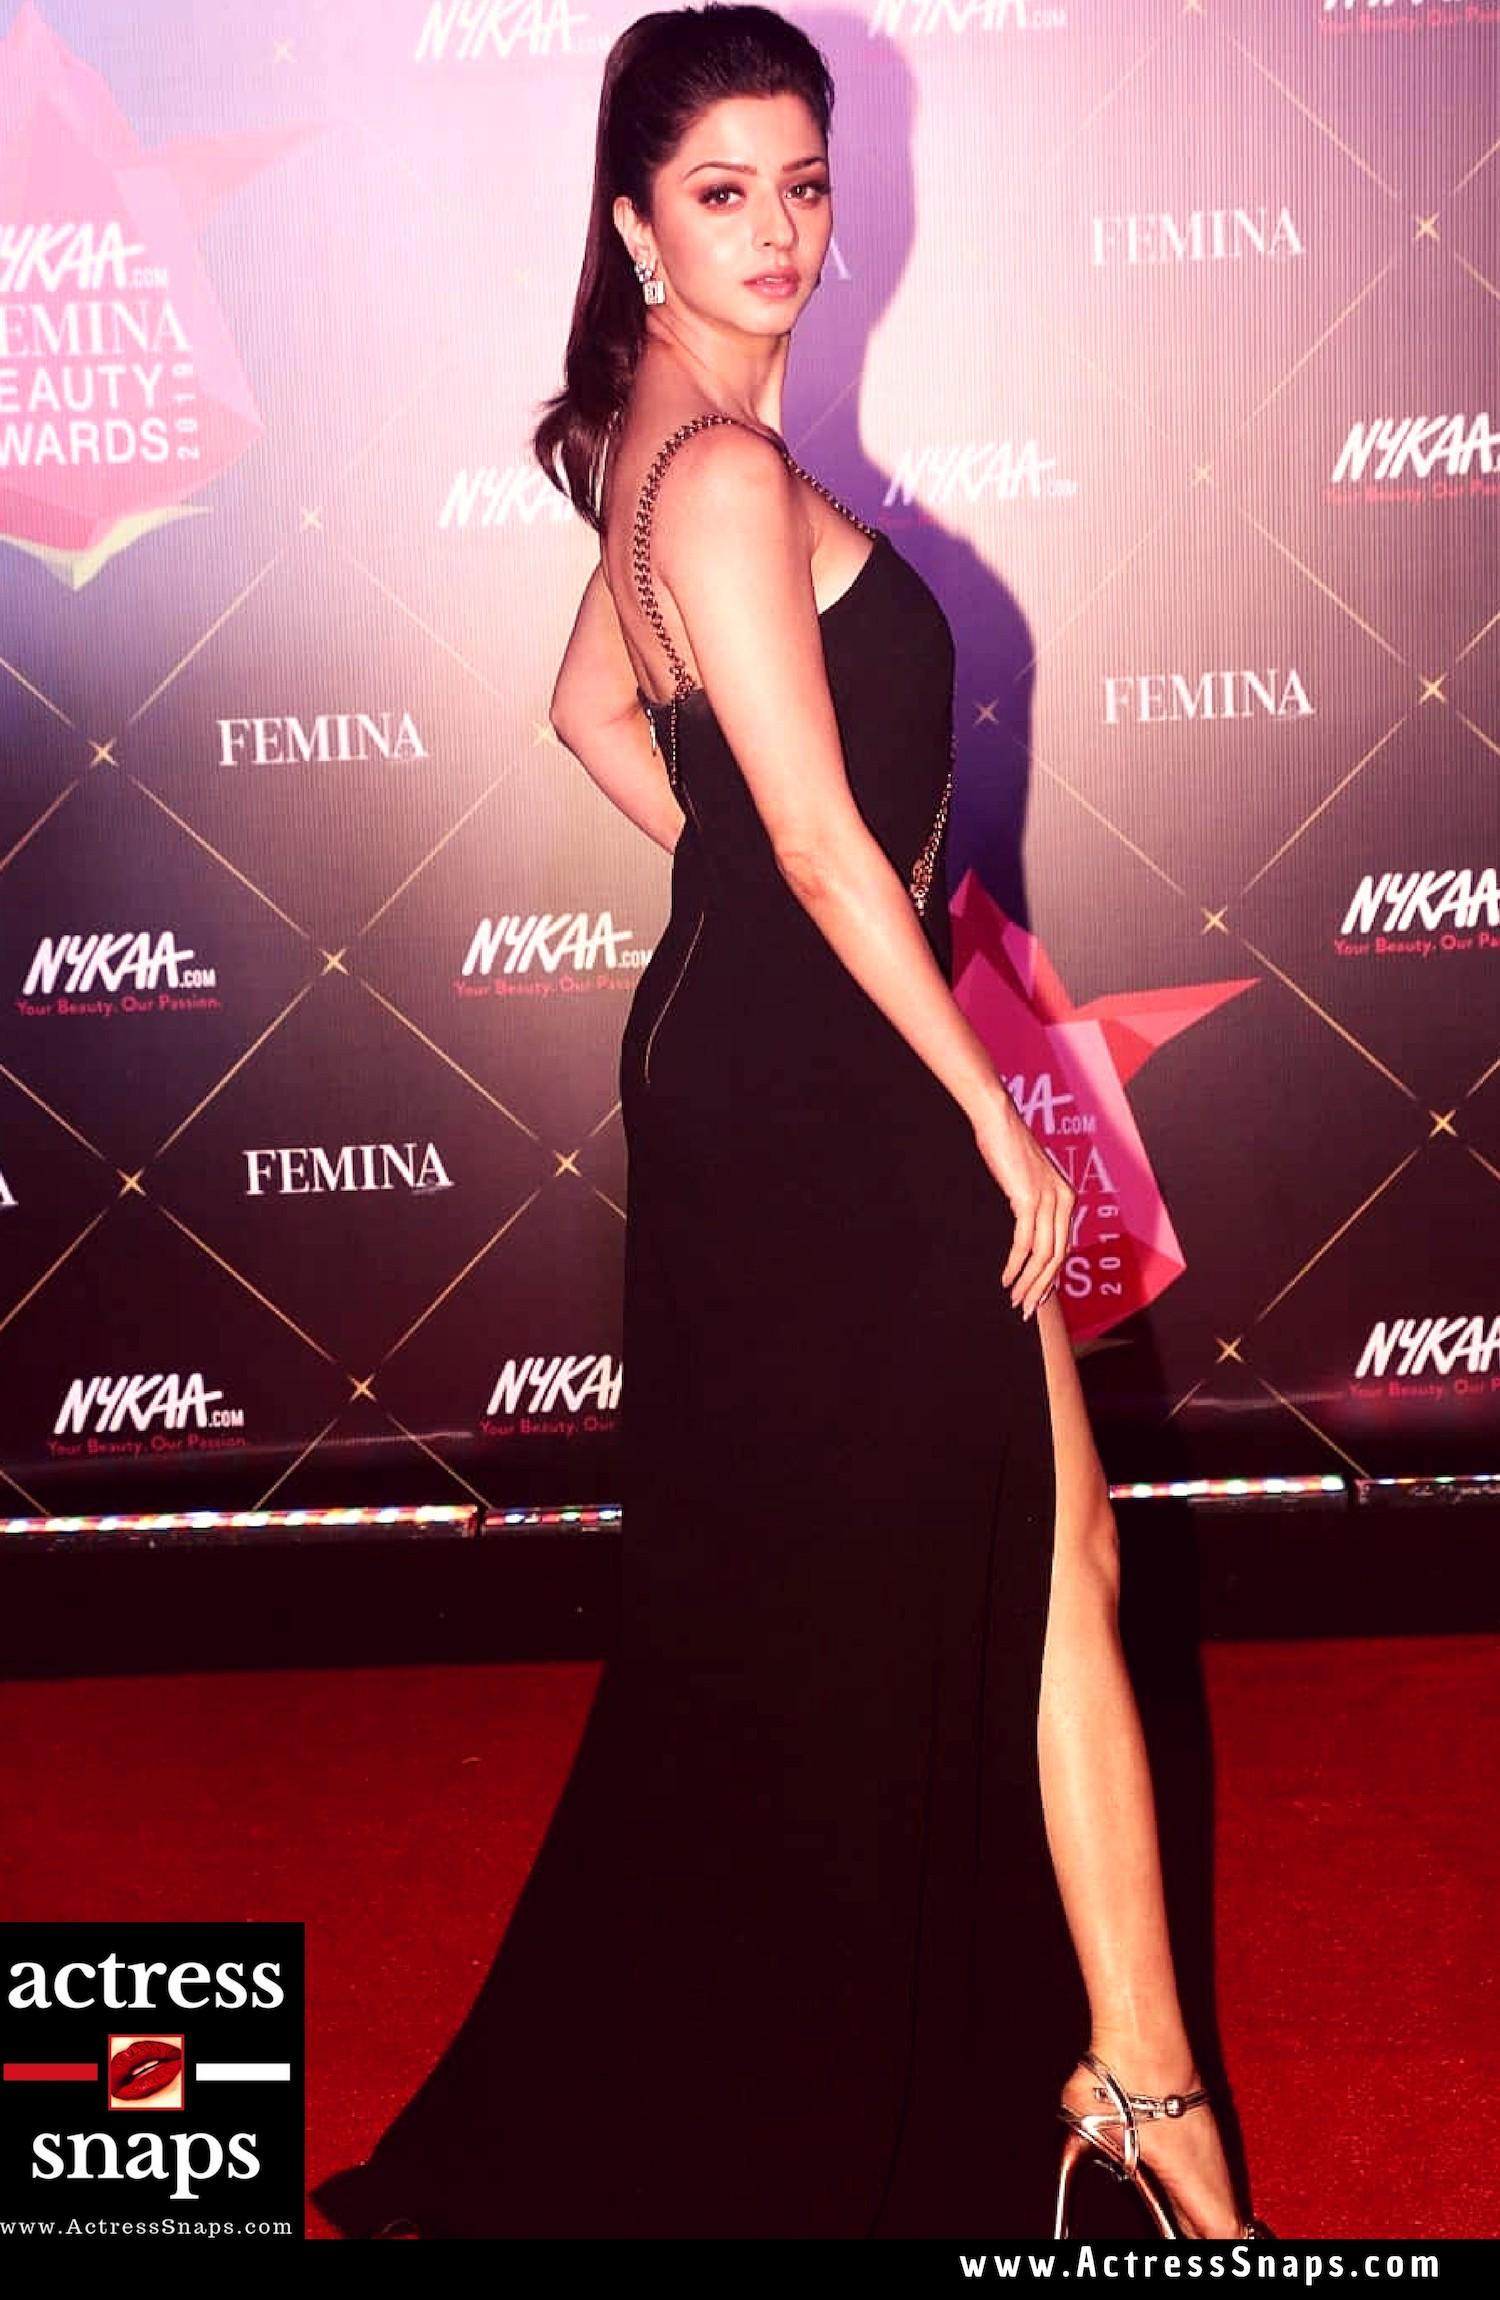 Vedhika Photos from Nyka Femina Awards - Sexy Actress Pictures | Hot Actress Pictures - ActressSnaps.com